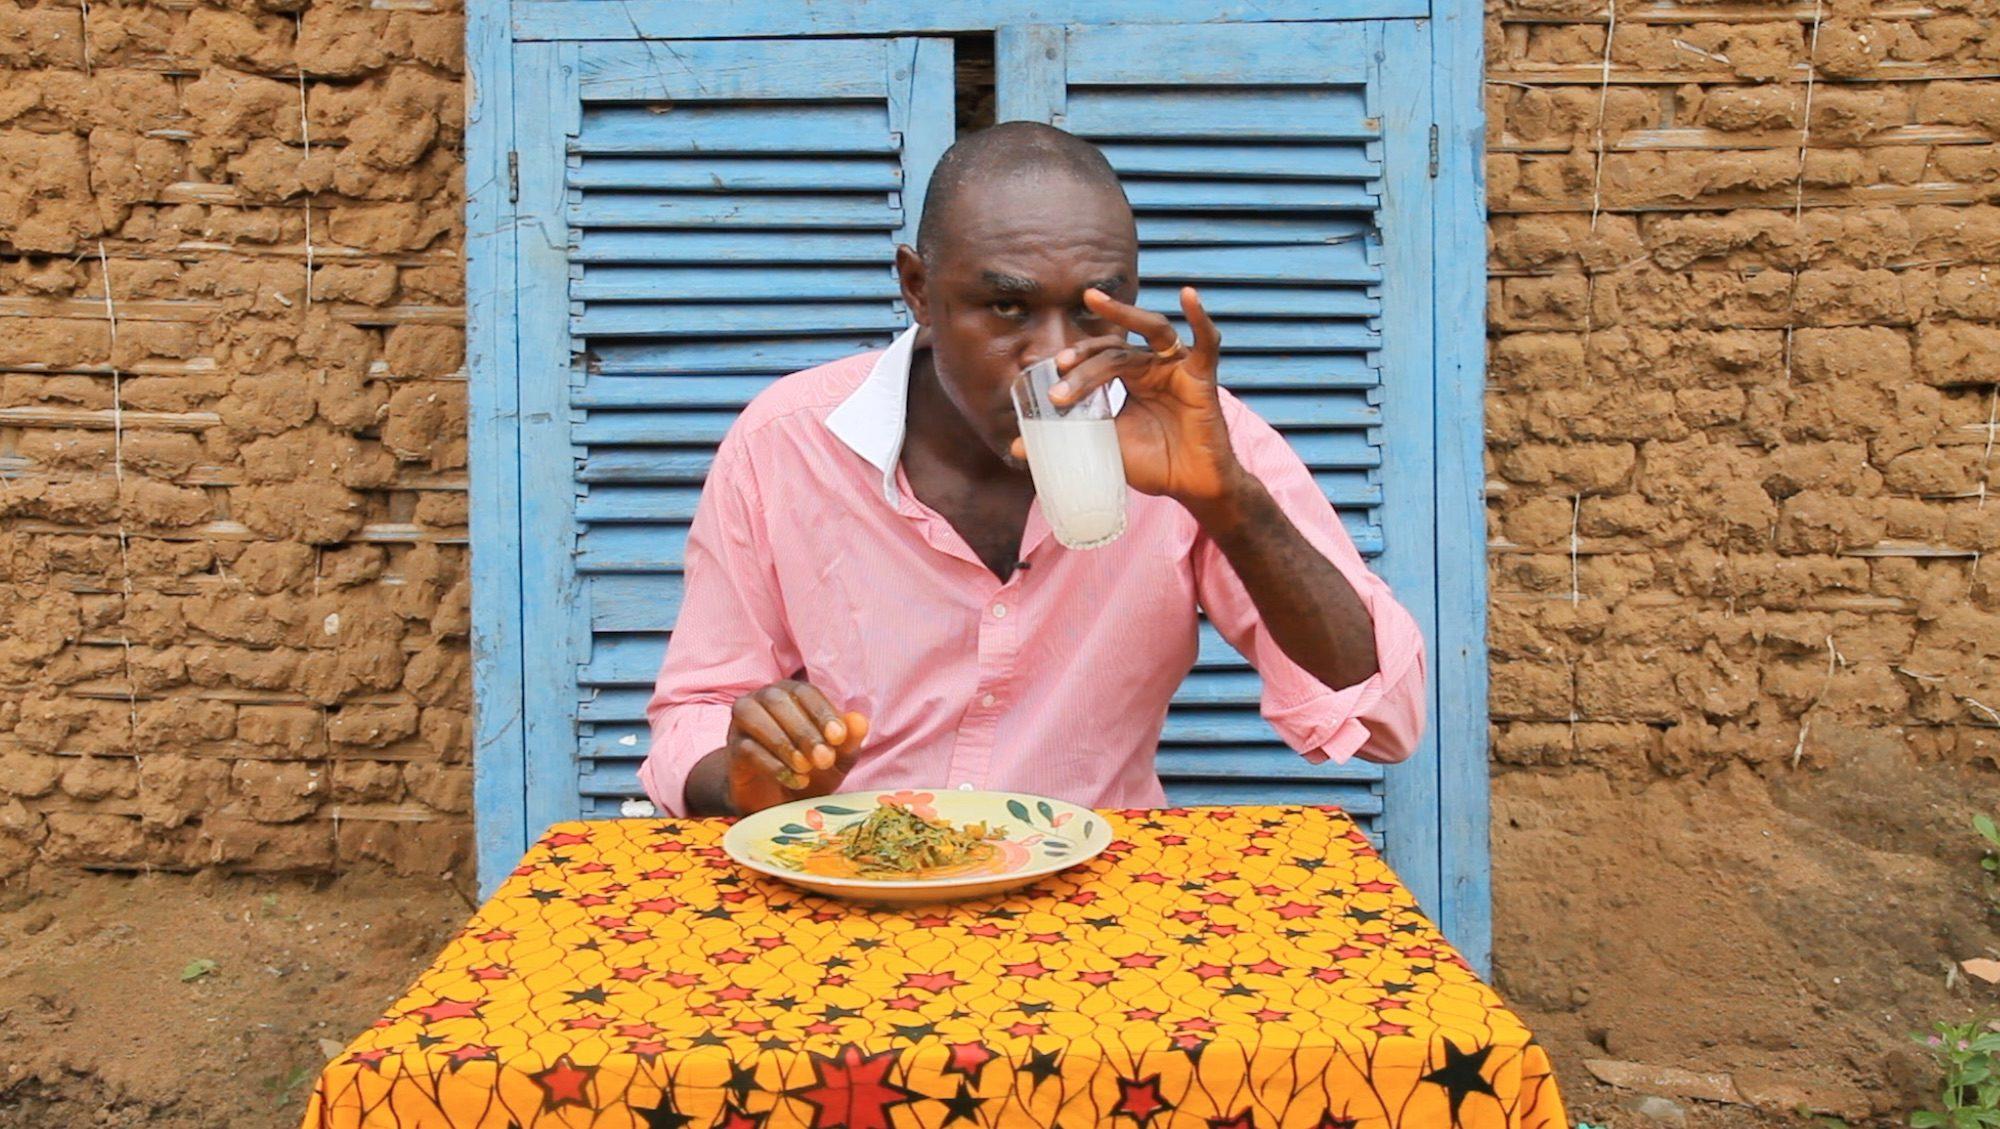 Art Basel - Zina Saro-Wiwa's Table Manners